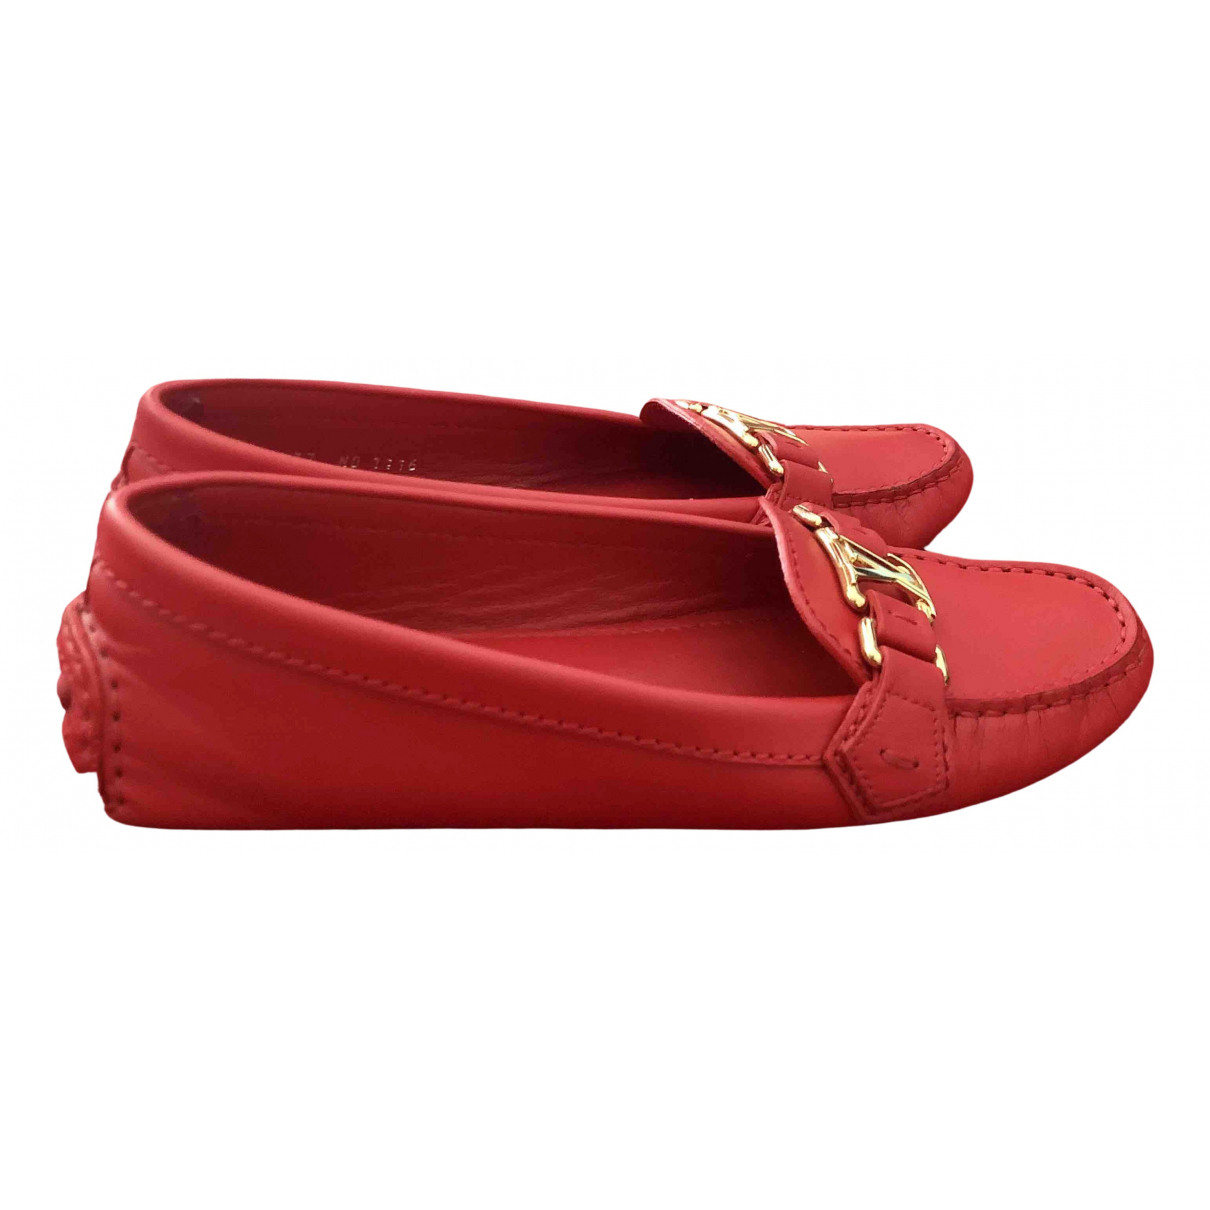 Louis Vuitton \N Red Leather Flats for Women 37 EU